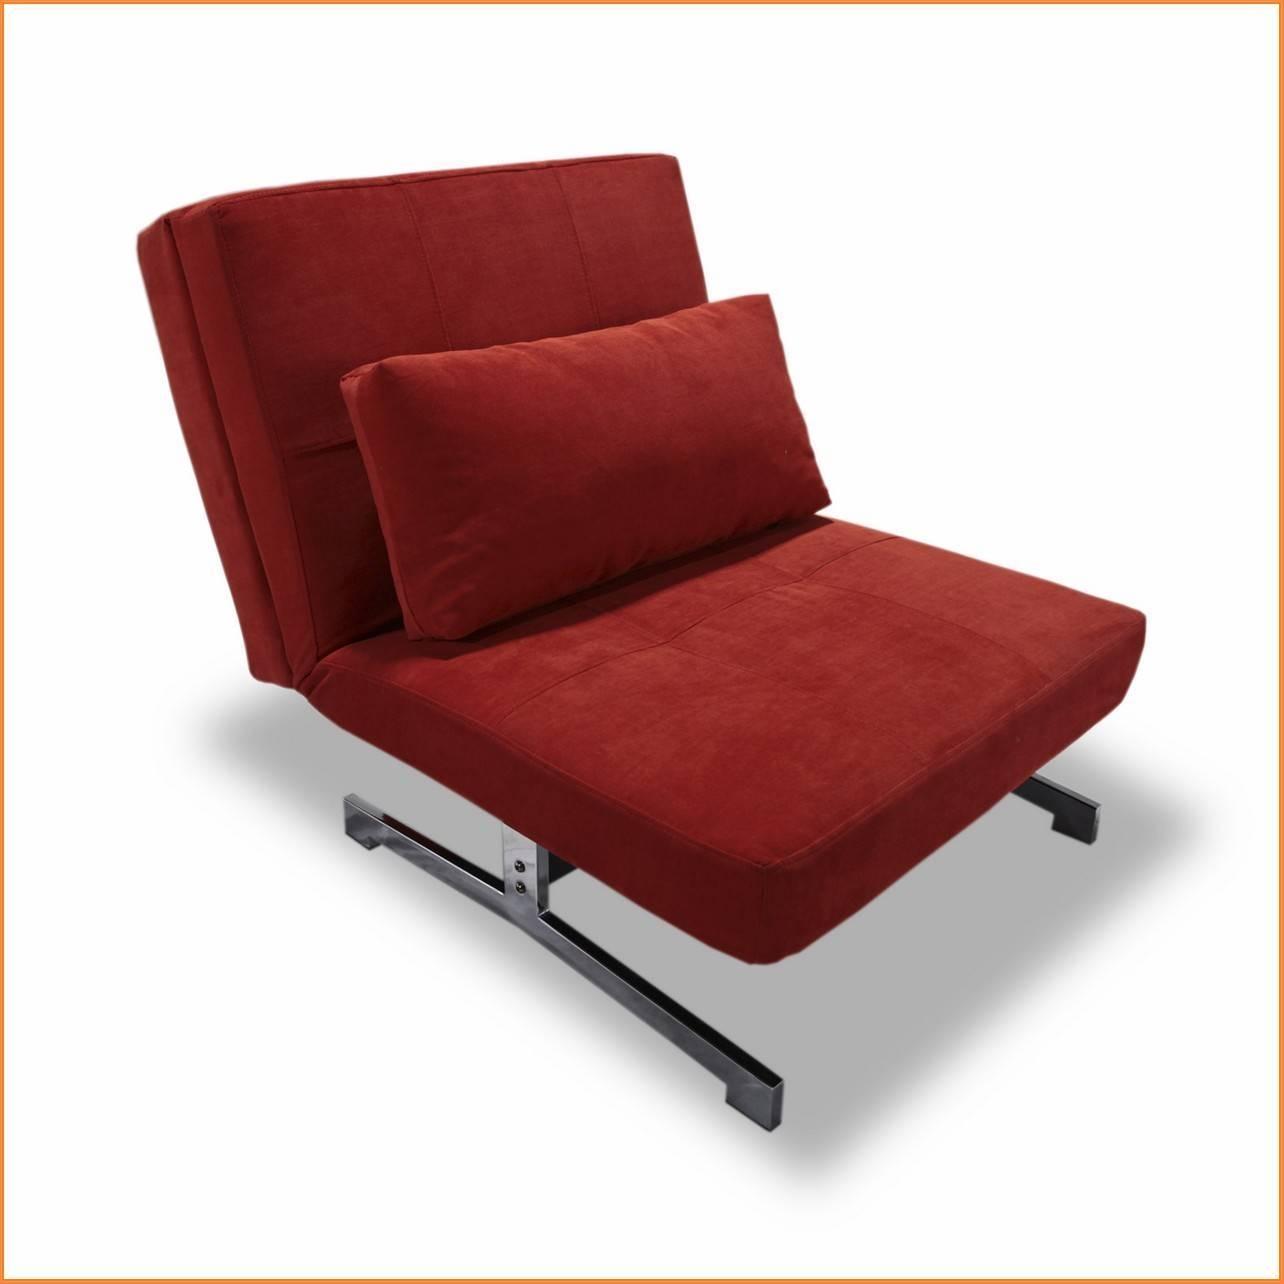 Living Room Sofa Sleeper Sheets Queen Singular Trend Rochester Ny regarding Sofa Sleeper Sheets (Image 3 of 15)